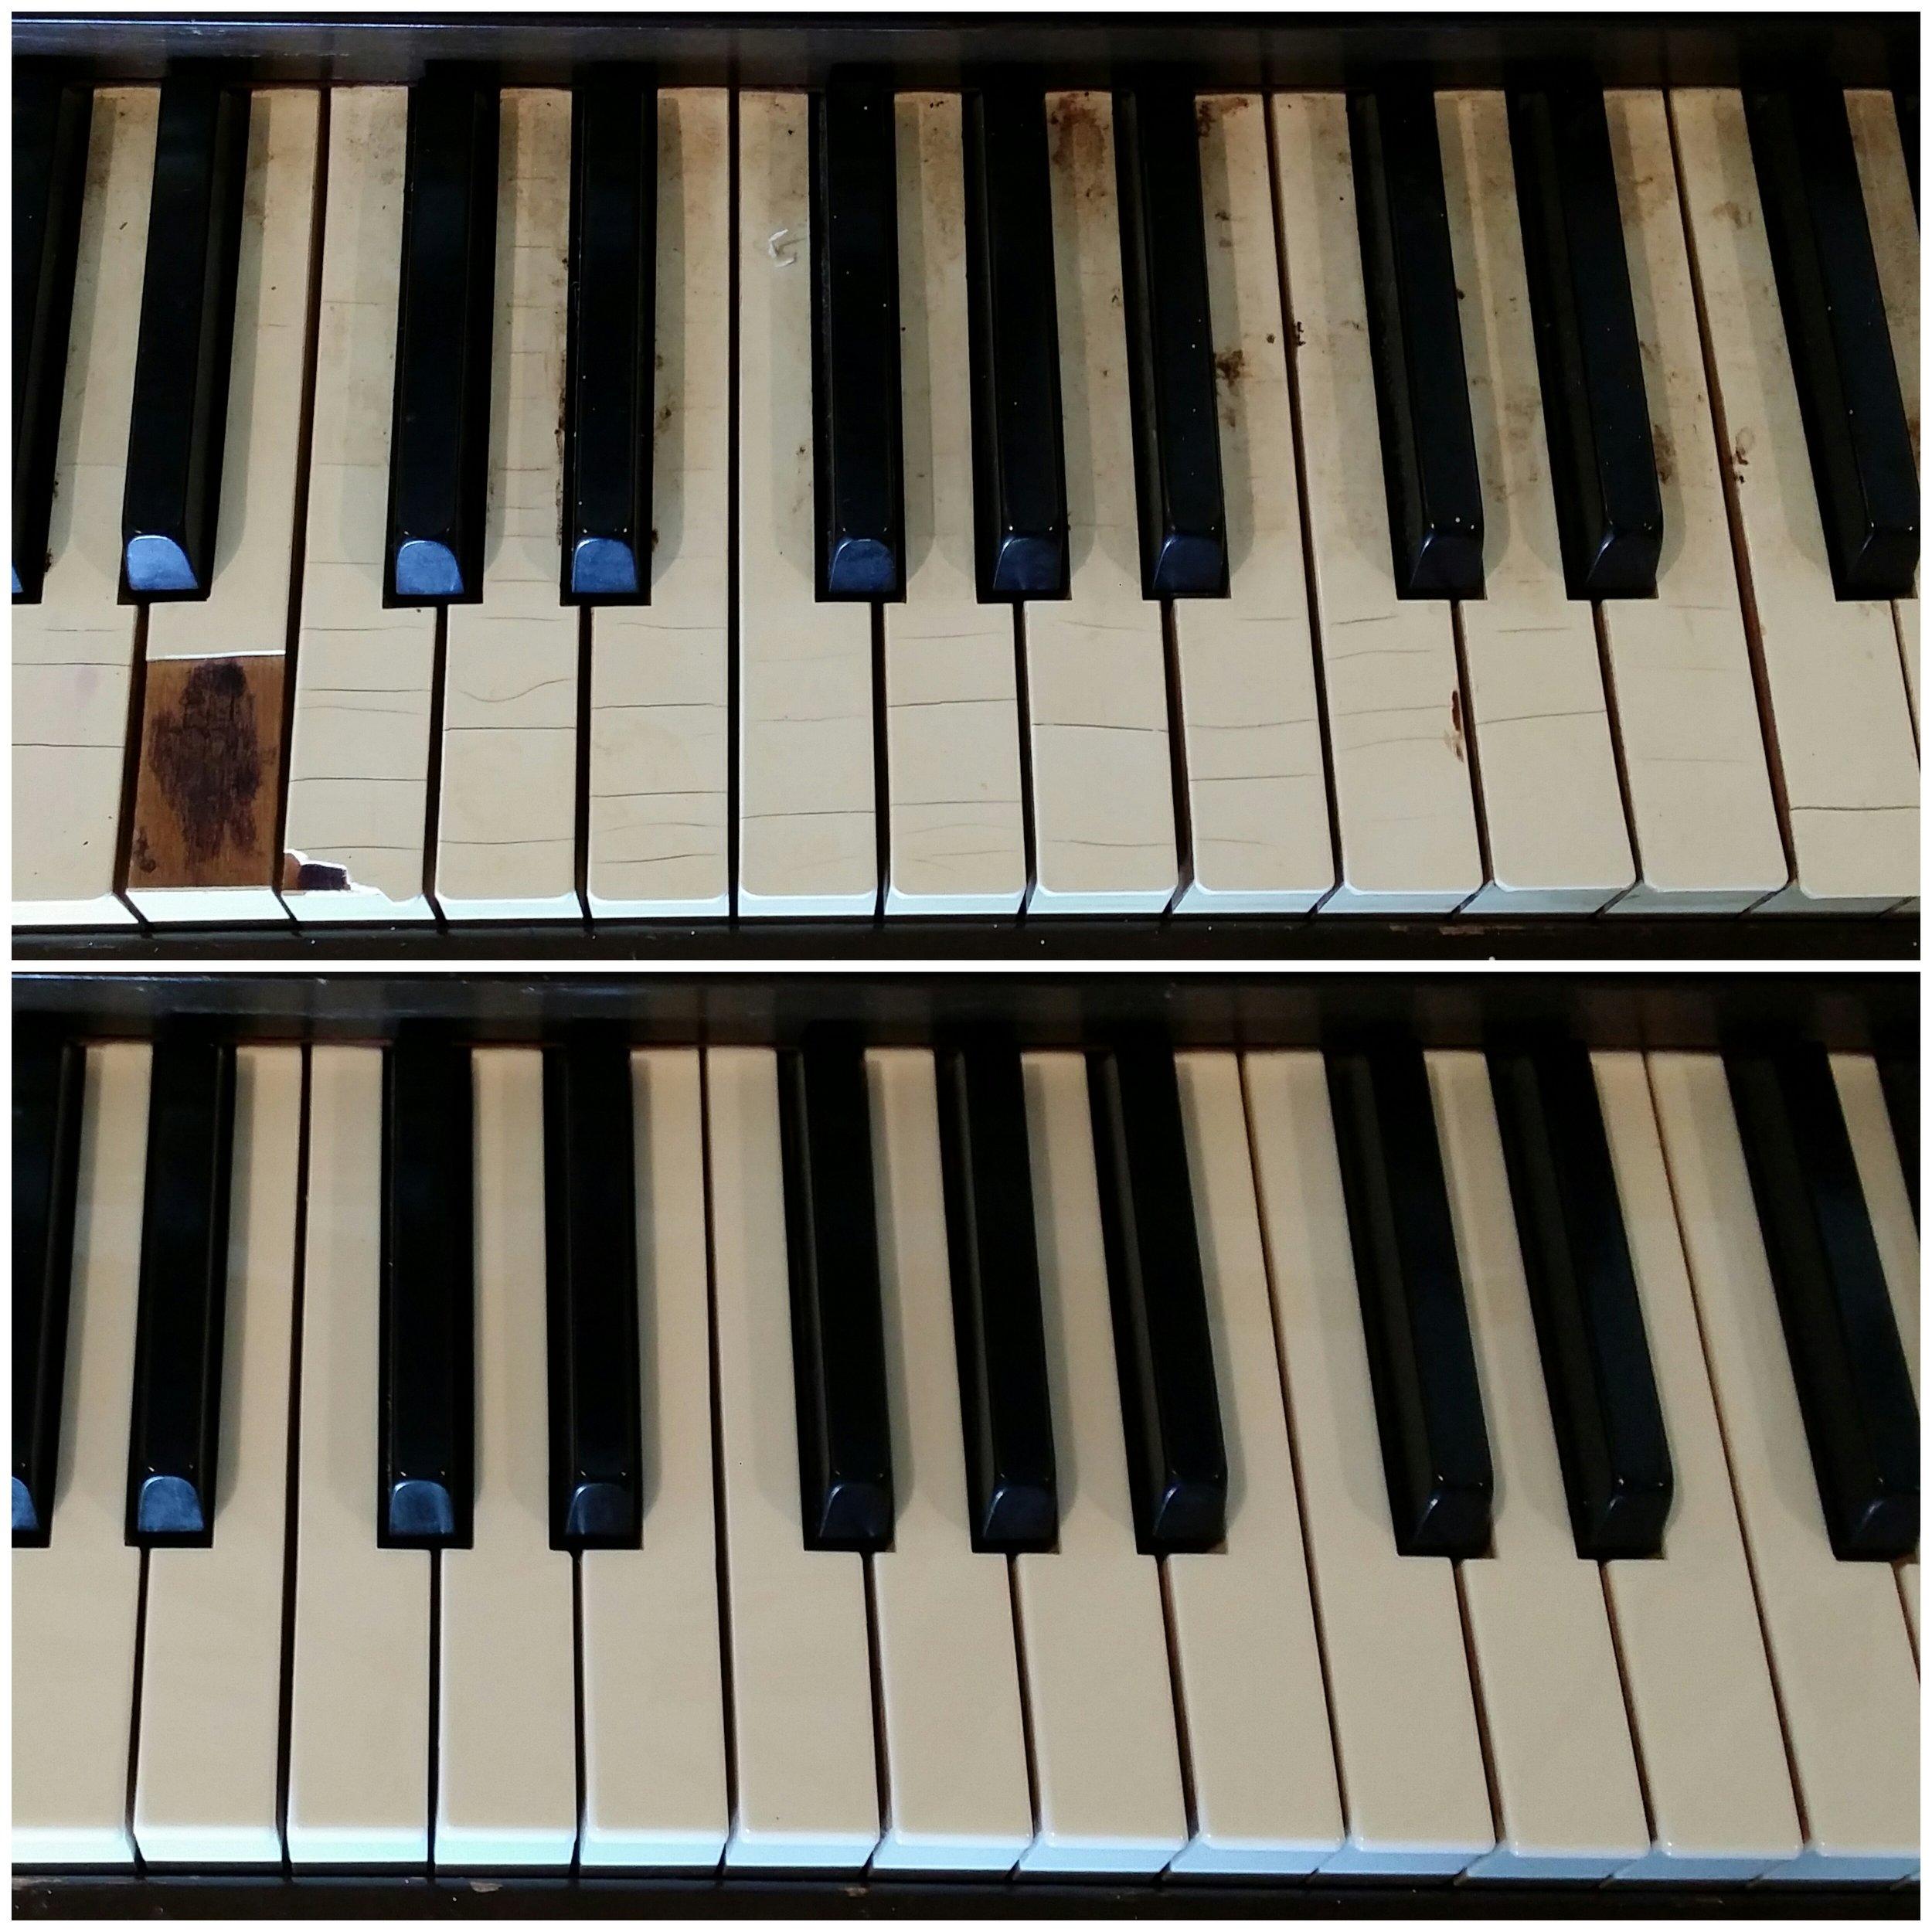 Close-up Keytops Before and After